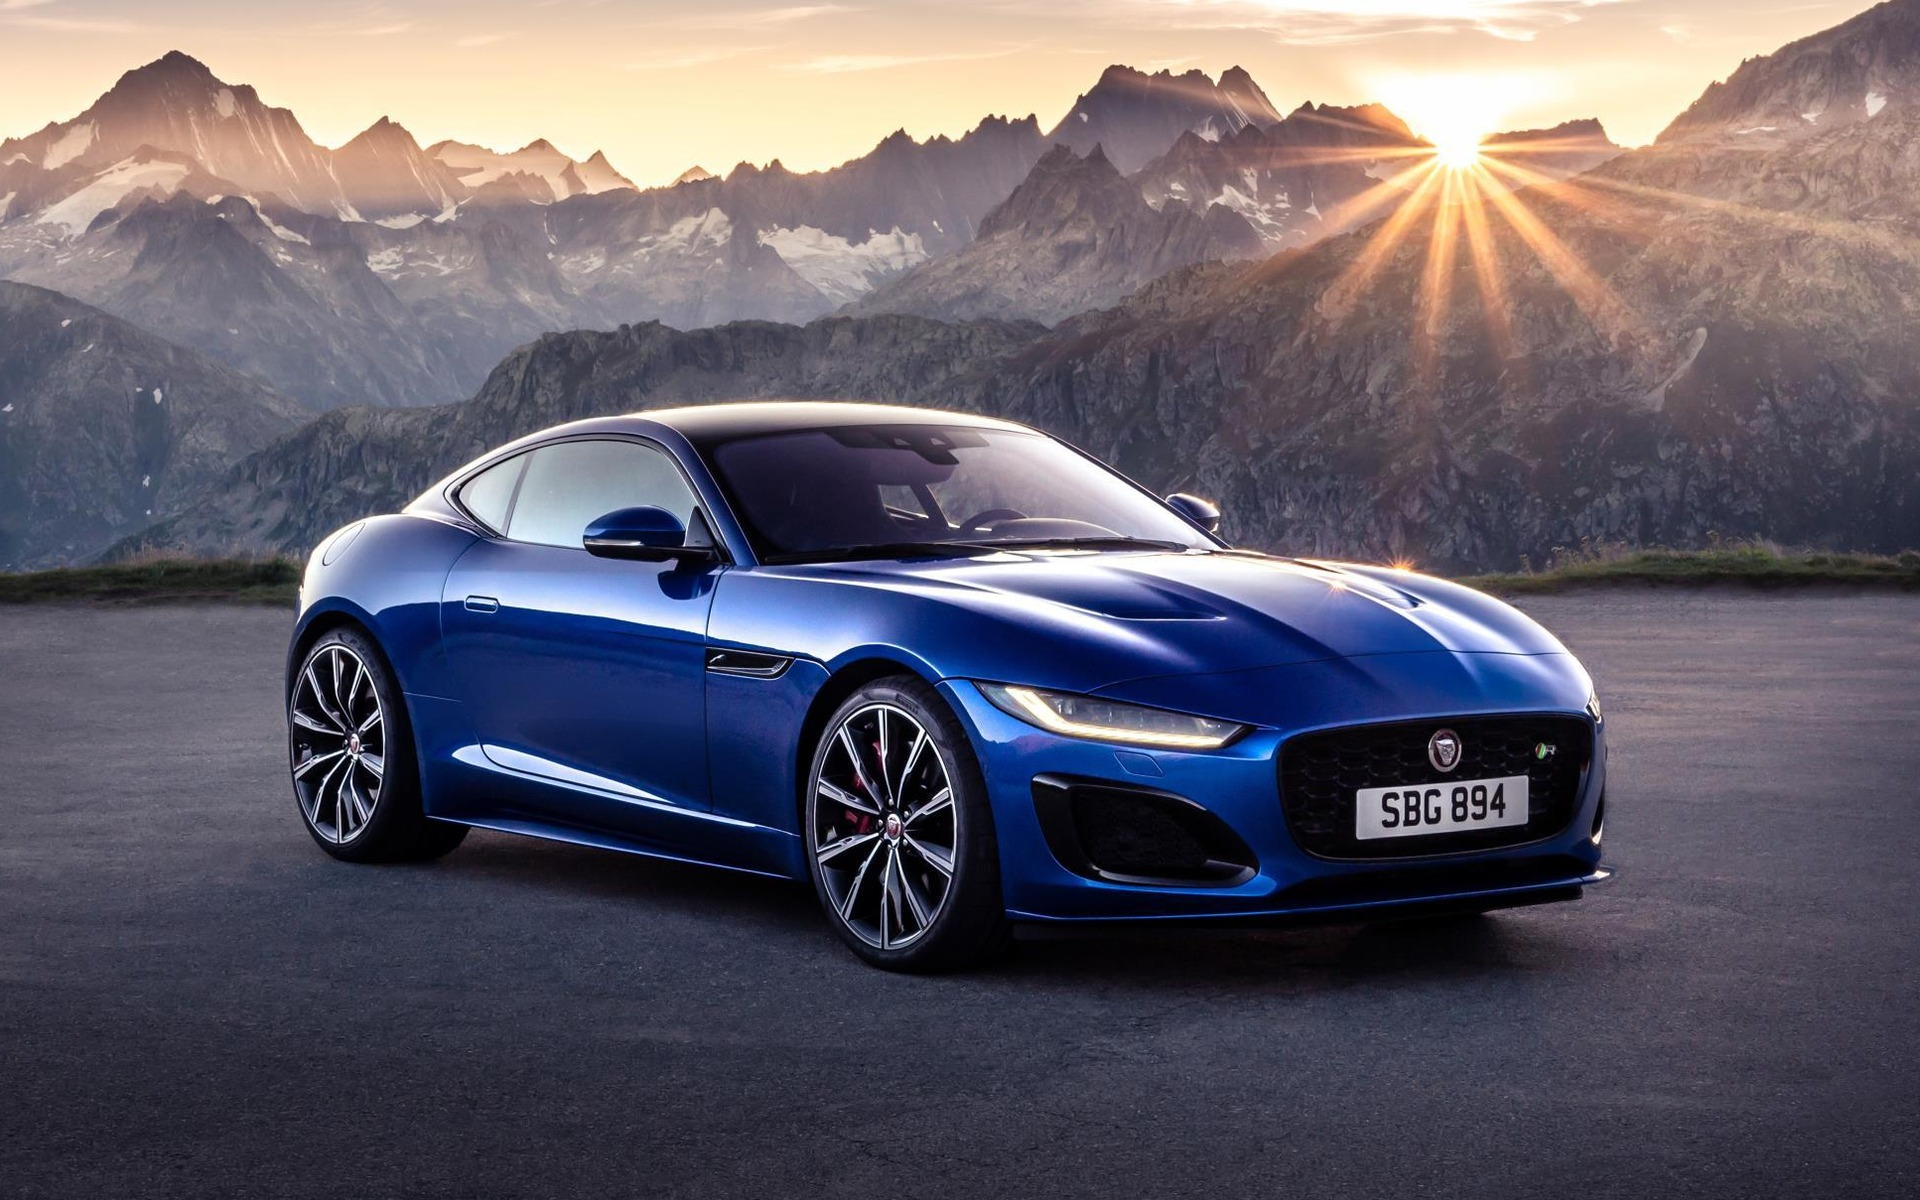 2021 Jaguar F-Type Specs